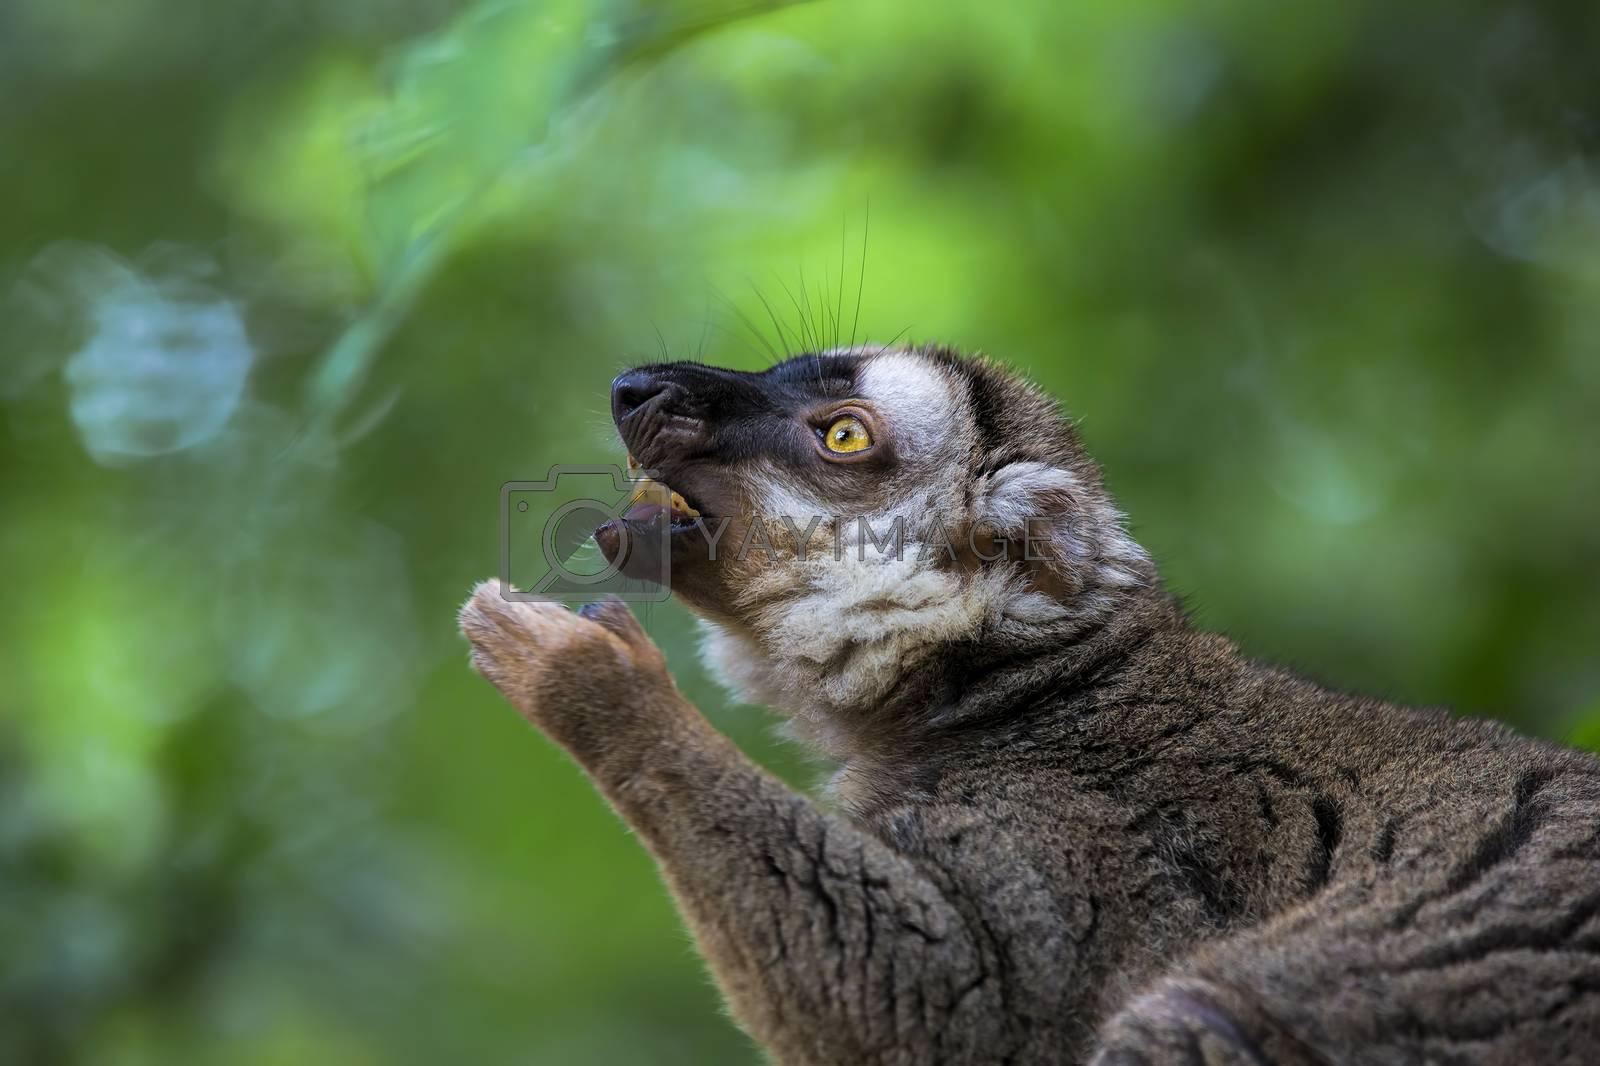 Royalty free image of Lemur portrait by kjorgen